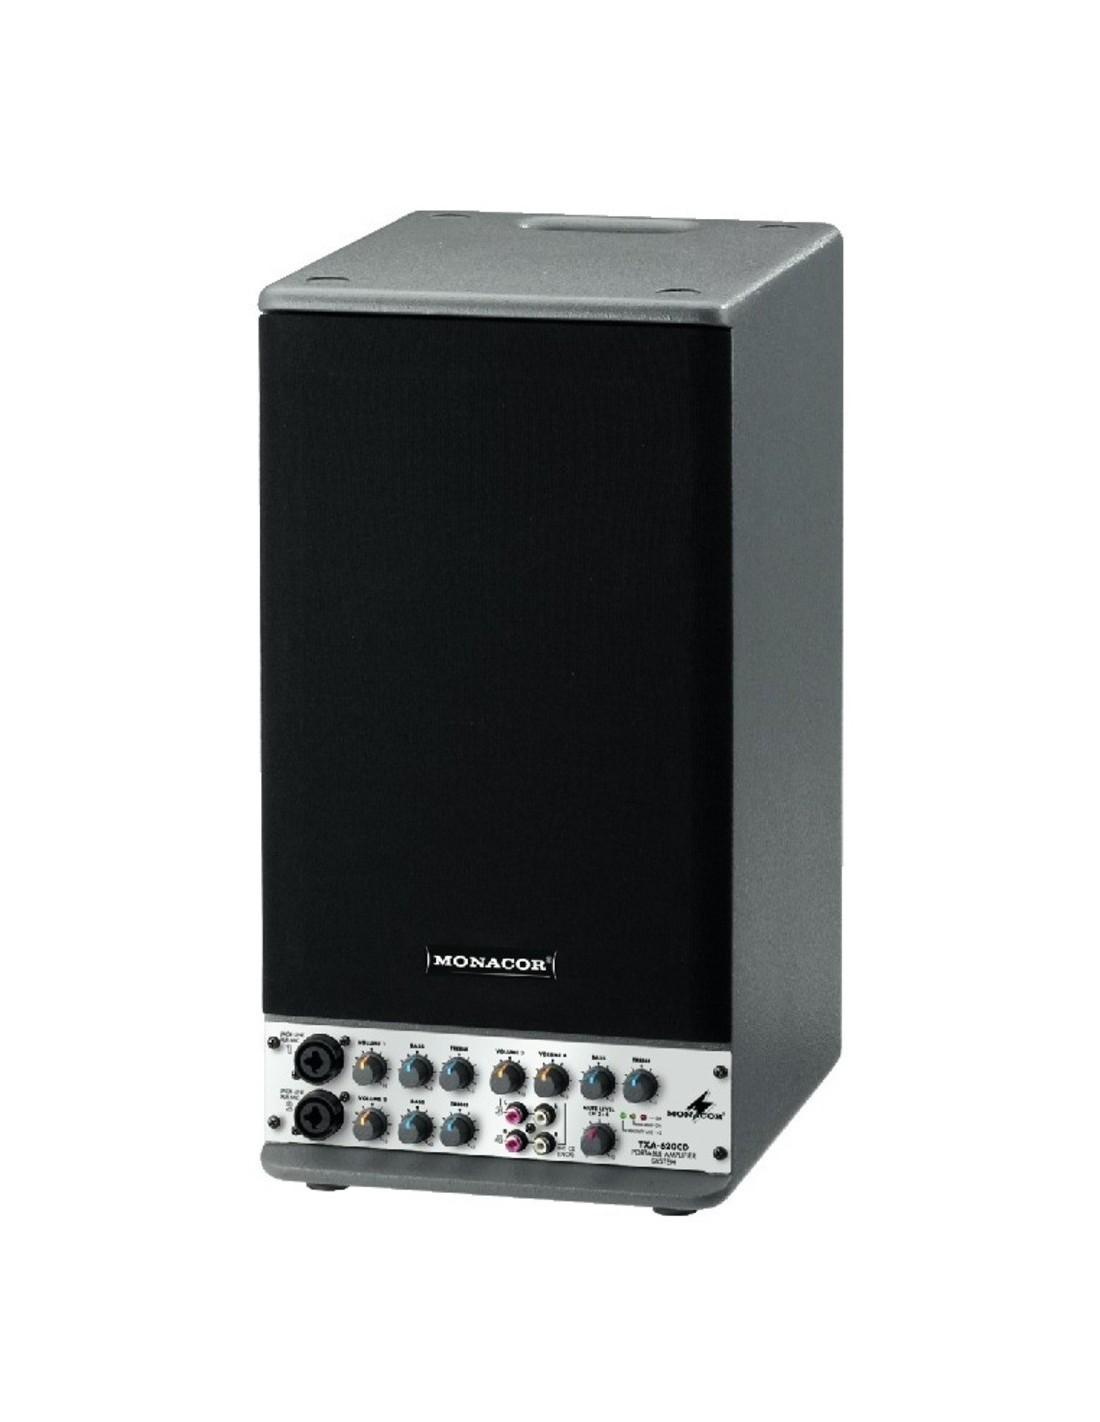 sonorisation portable professionnelle txa 620cd. Black Bedroom Furniture Sets. Home Design Ideas